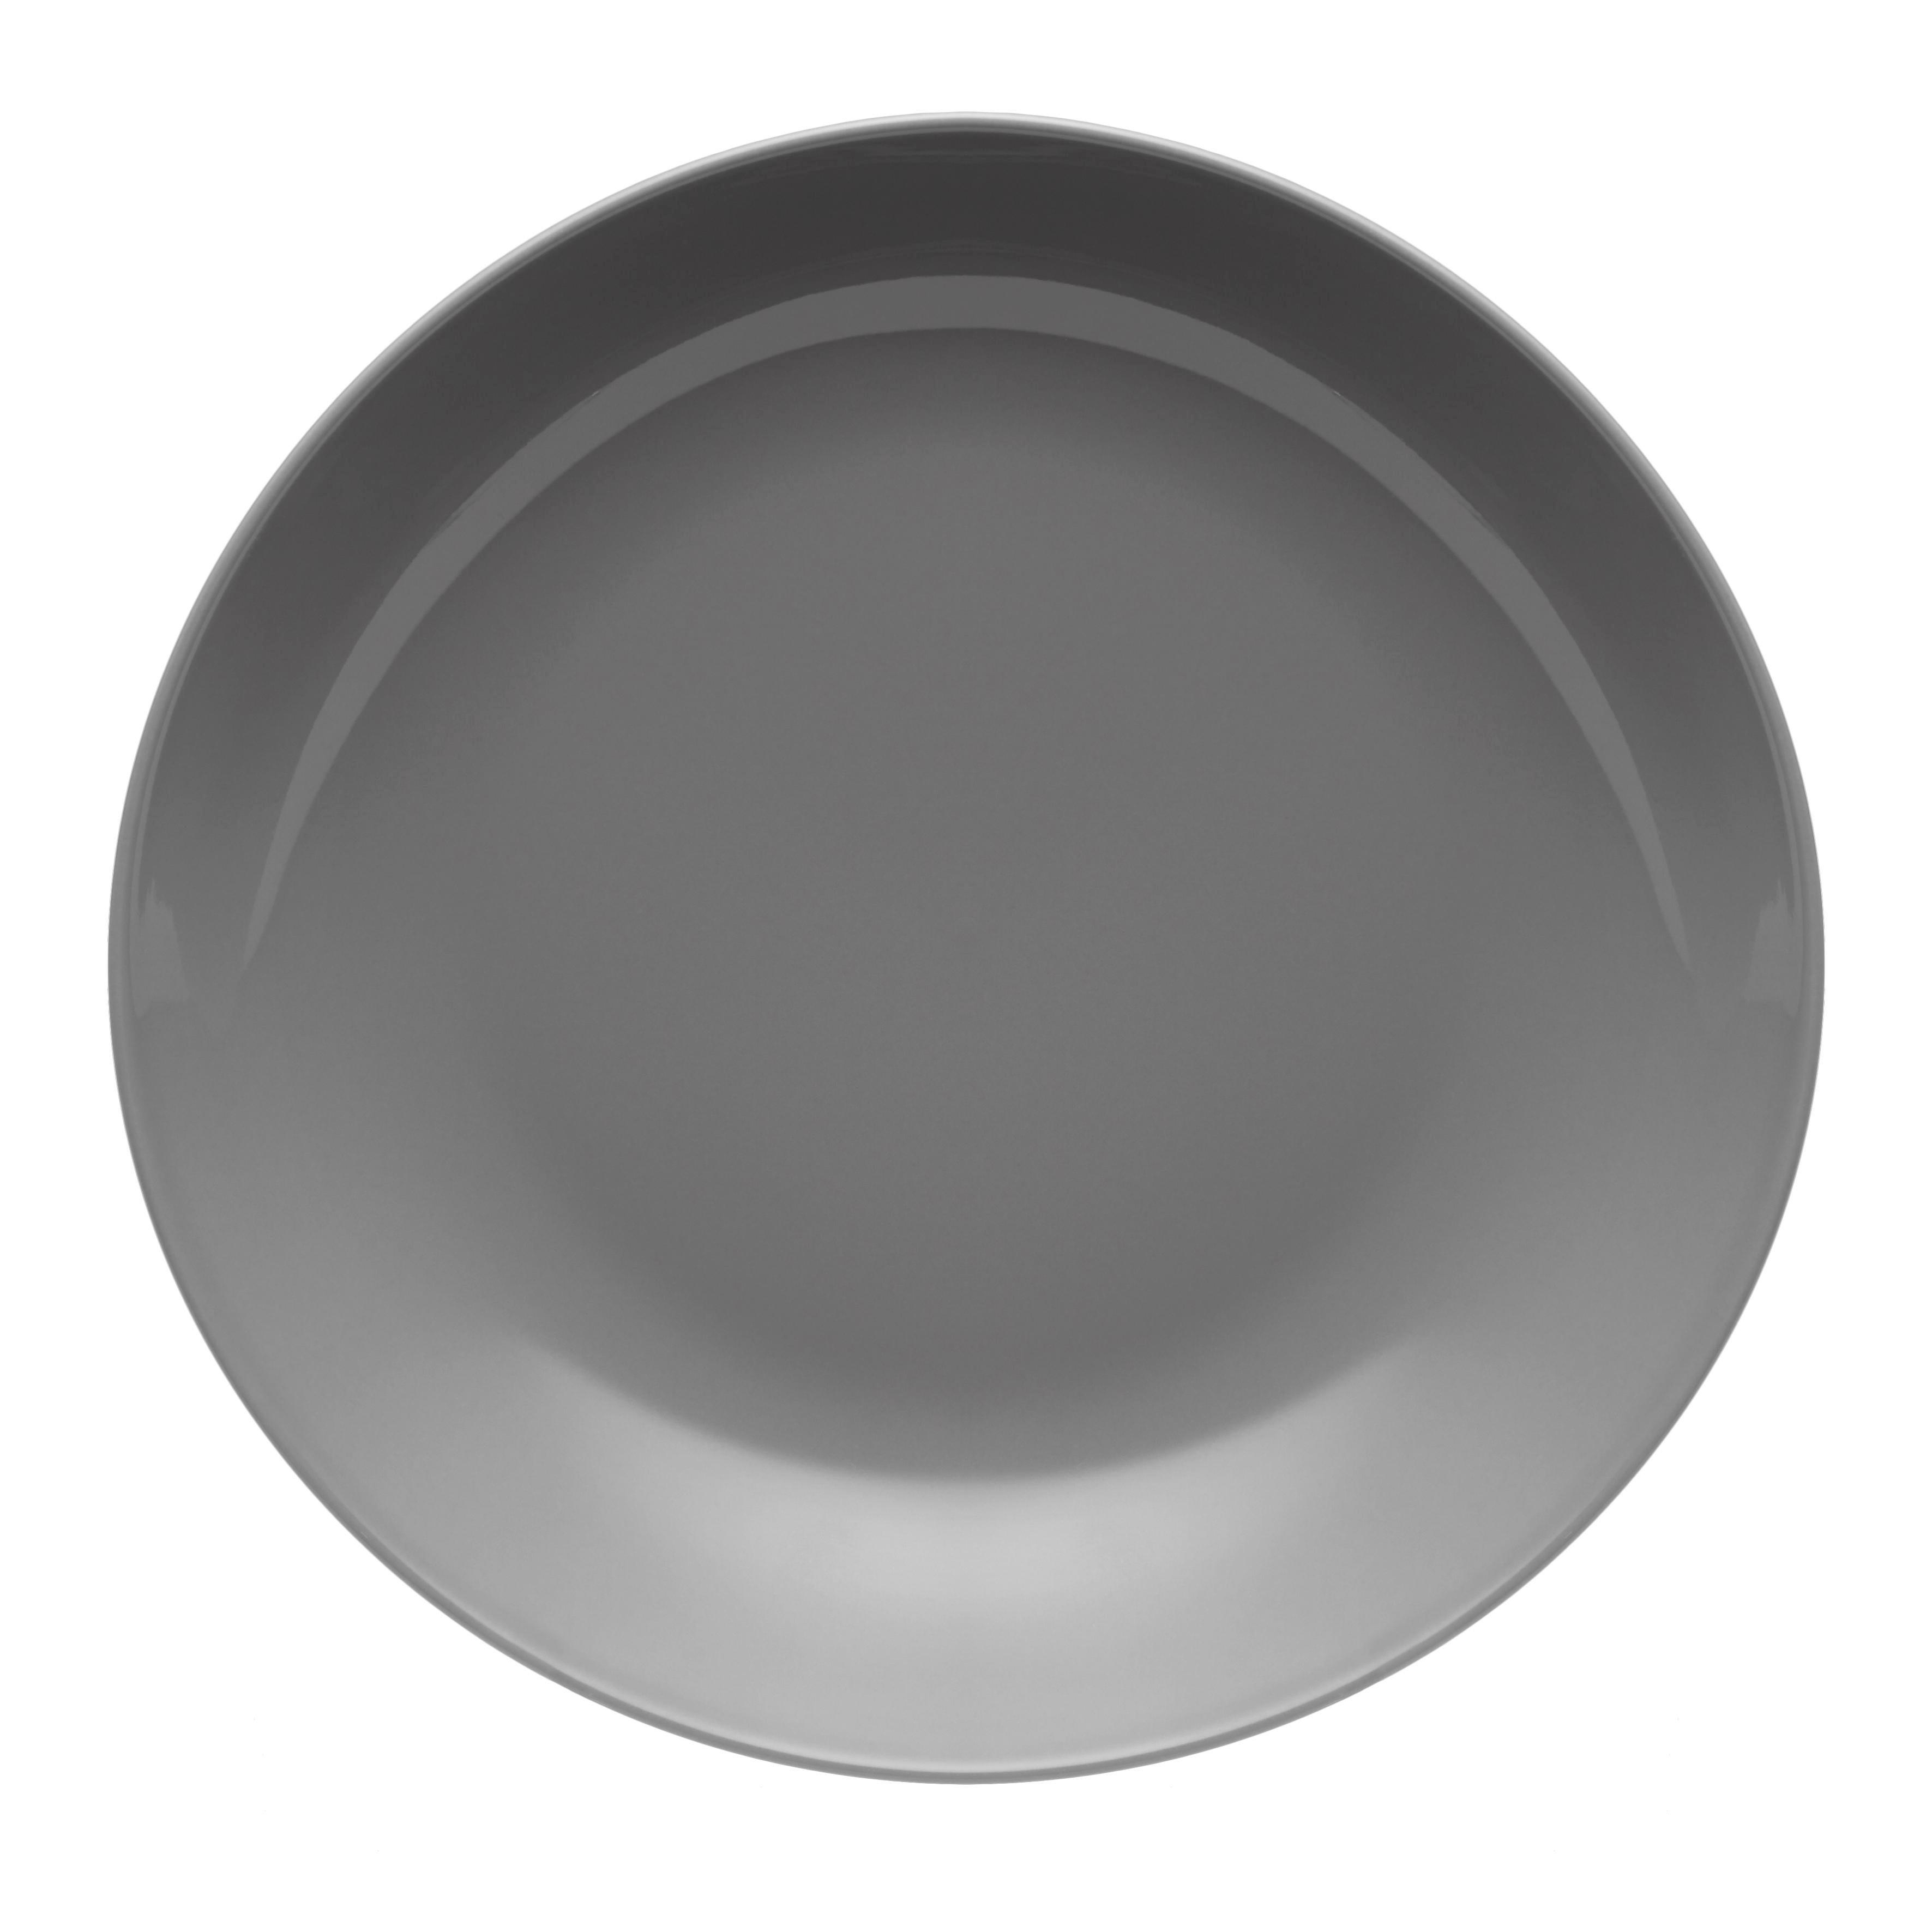 Suppenteller Sandy in Grau aus Keramik - Grau, KONVENTIONELL, Keramik (20/3,5cm) - MÖMAX modern living